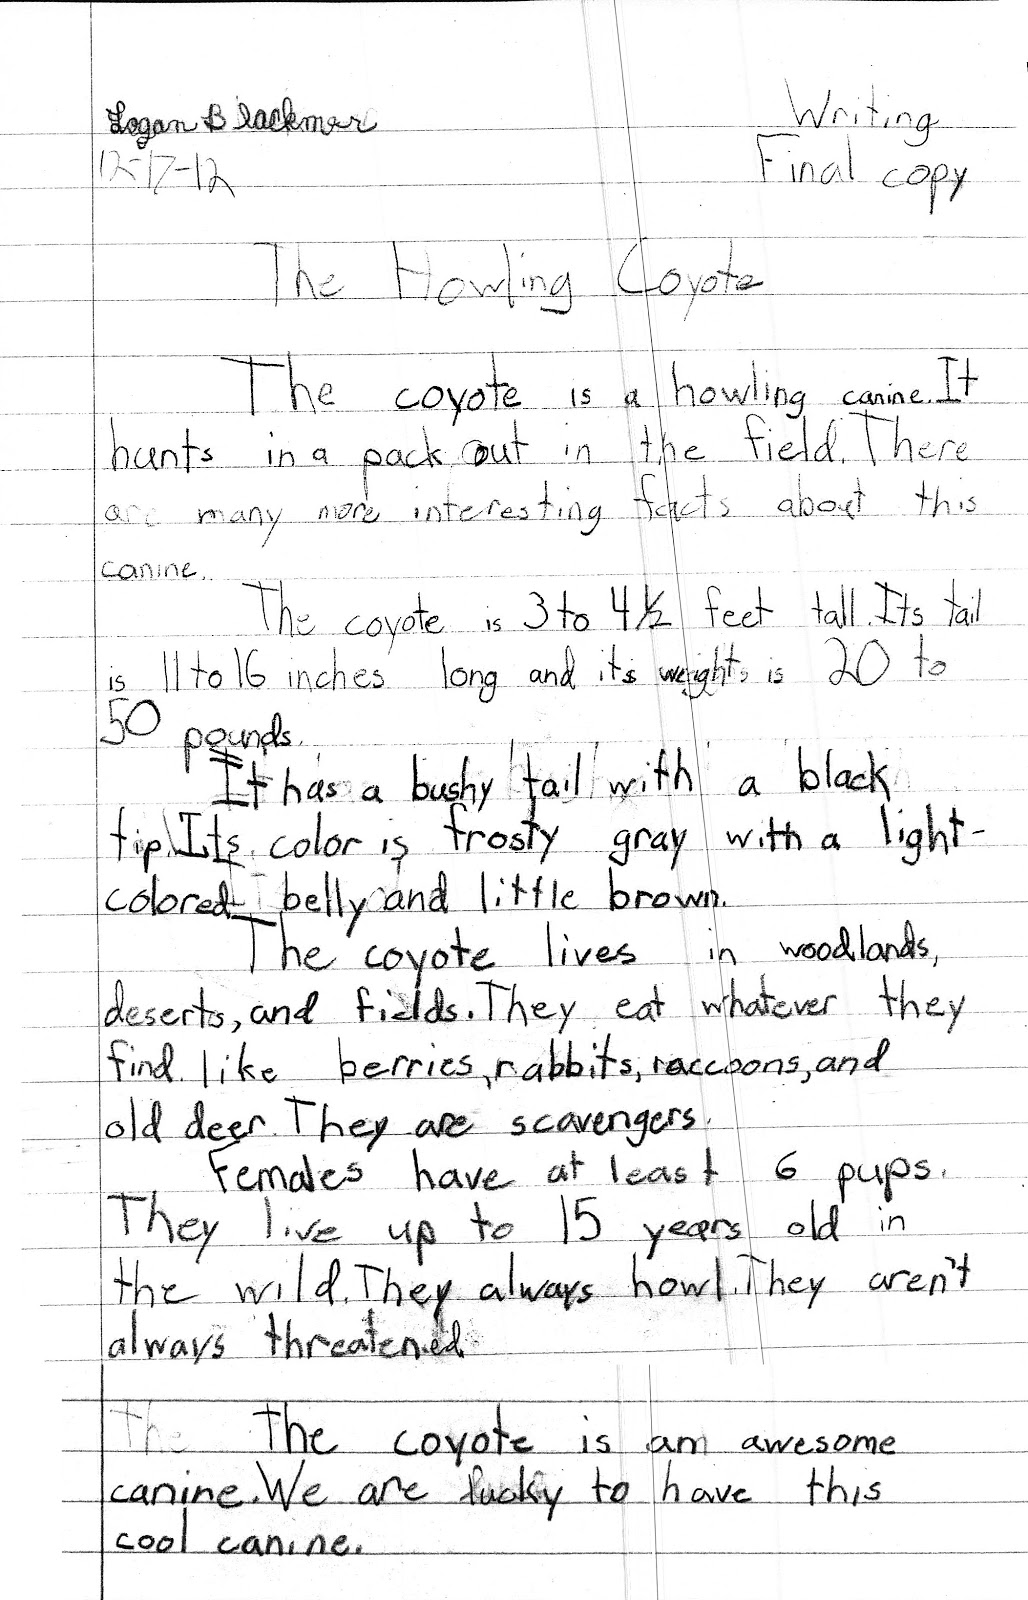 essay about adoption adoption essay sample